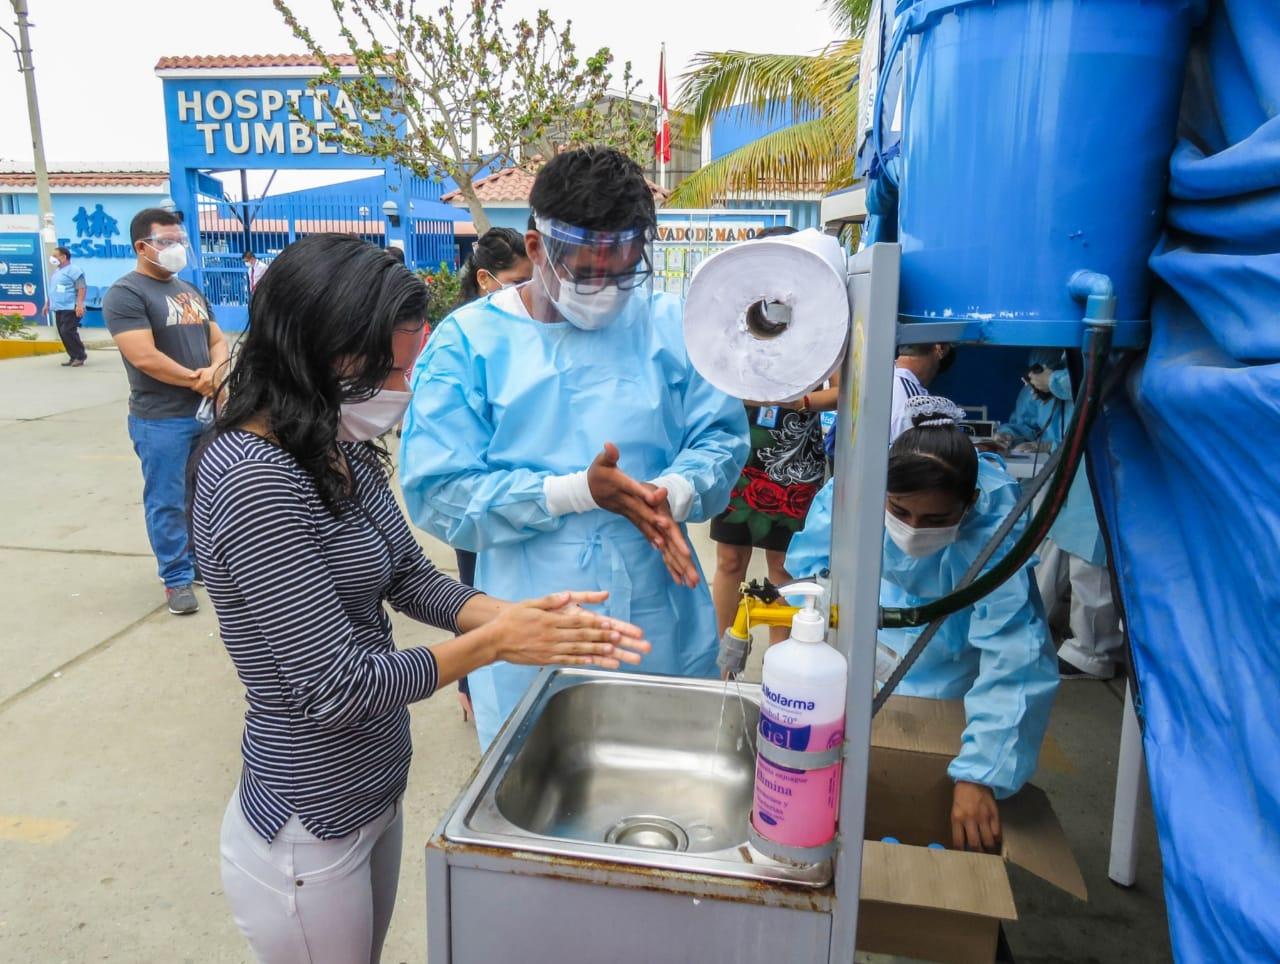 Essalud - EsSalud Tumbes realiza jornadas de lavado de manos